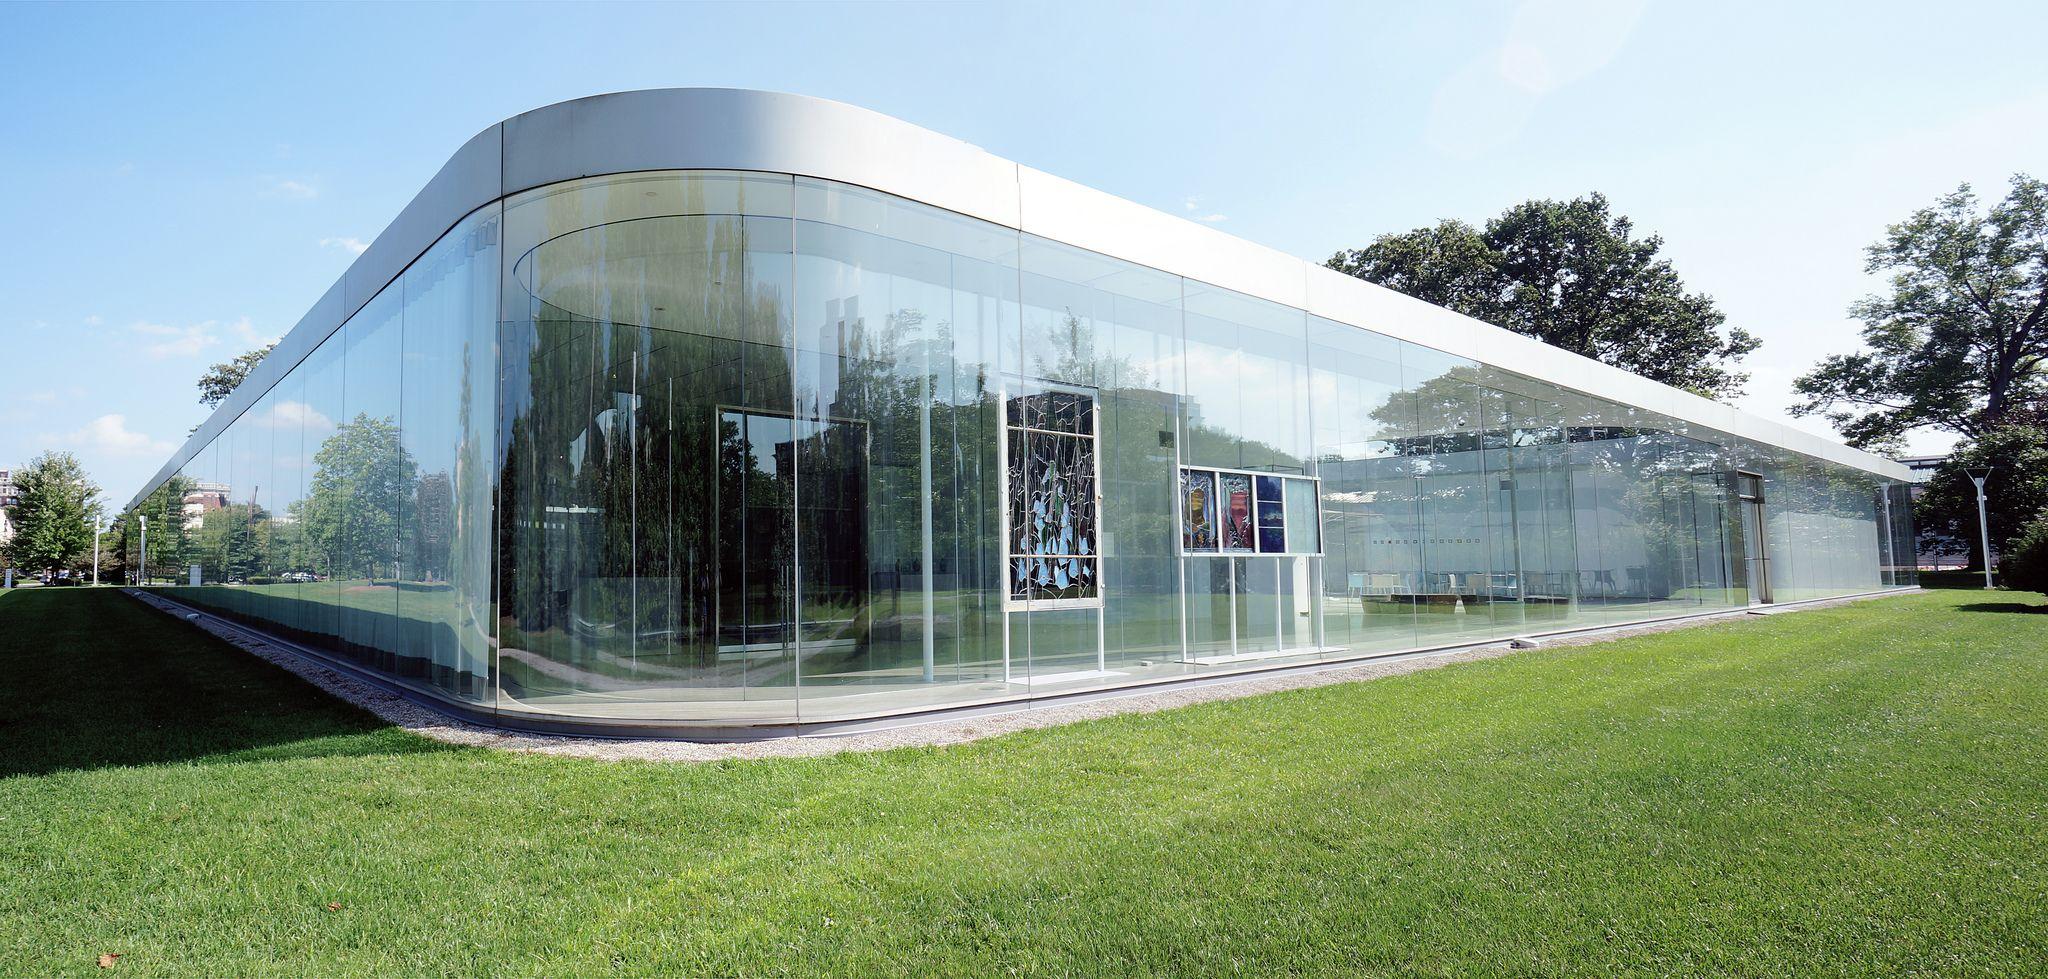 sanaa glass pavilion at the toledo museum of art ohio 2 a f a s i a. Black Bedroom Furniture Sets. Home Design Ideas